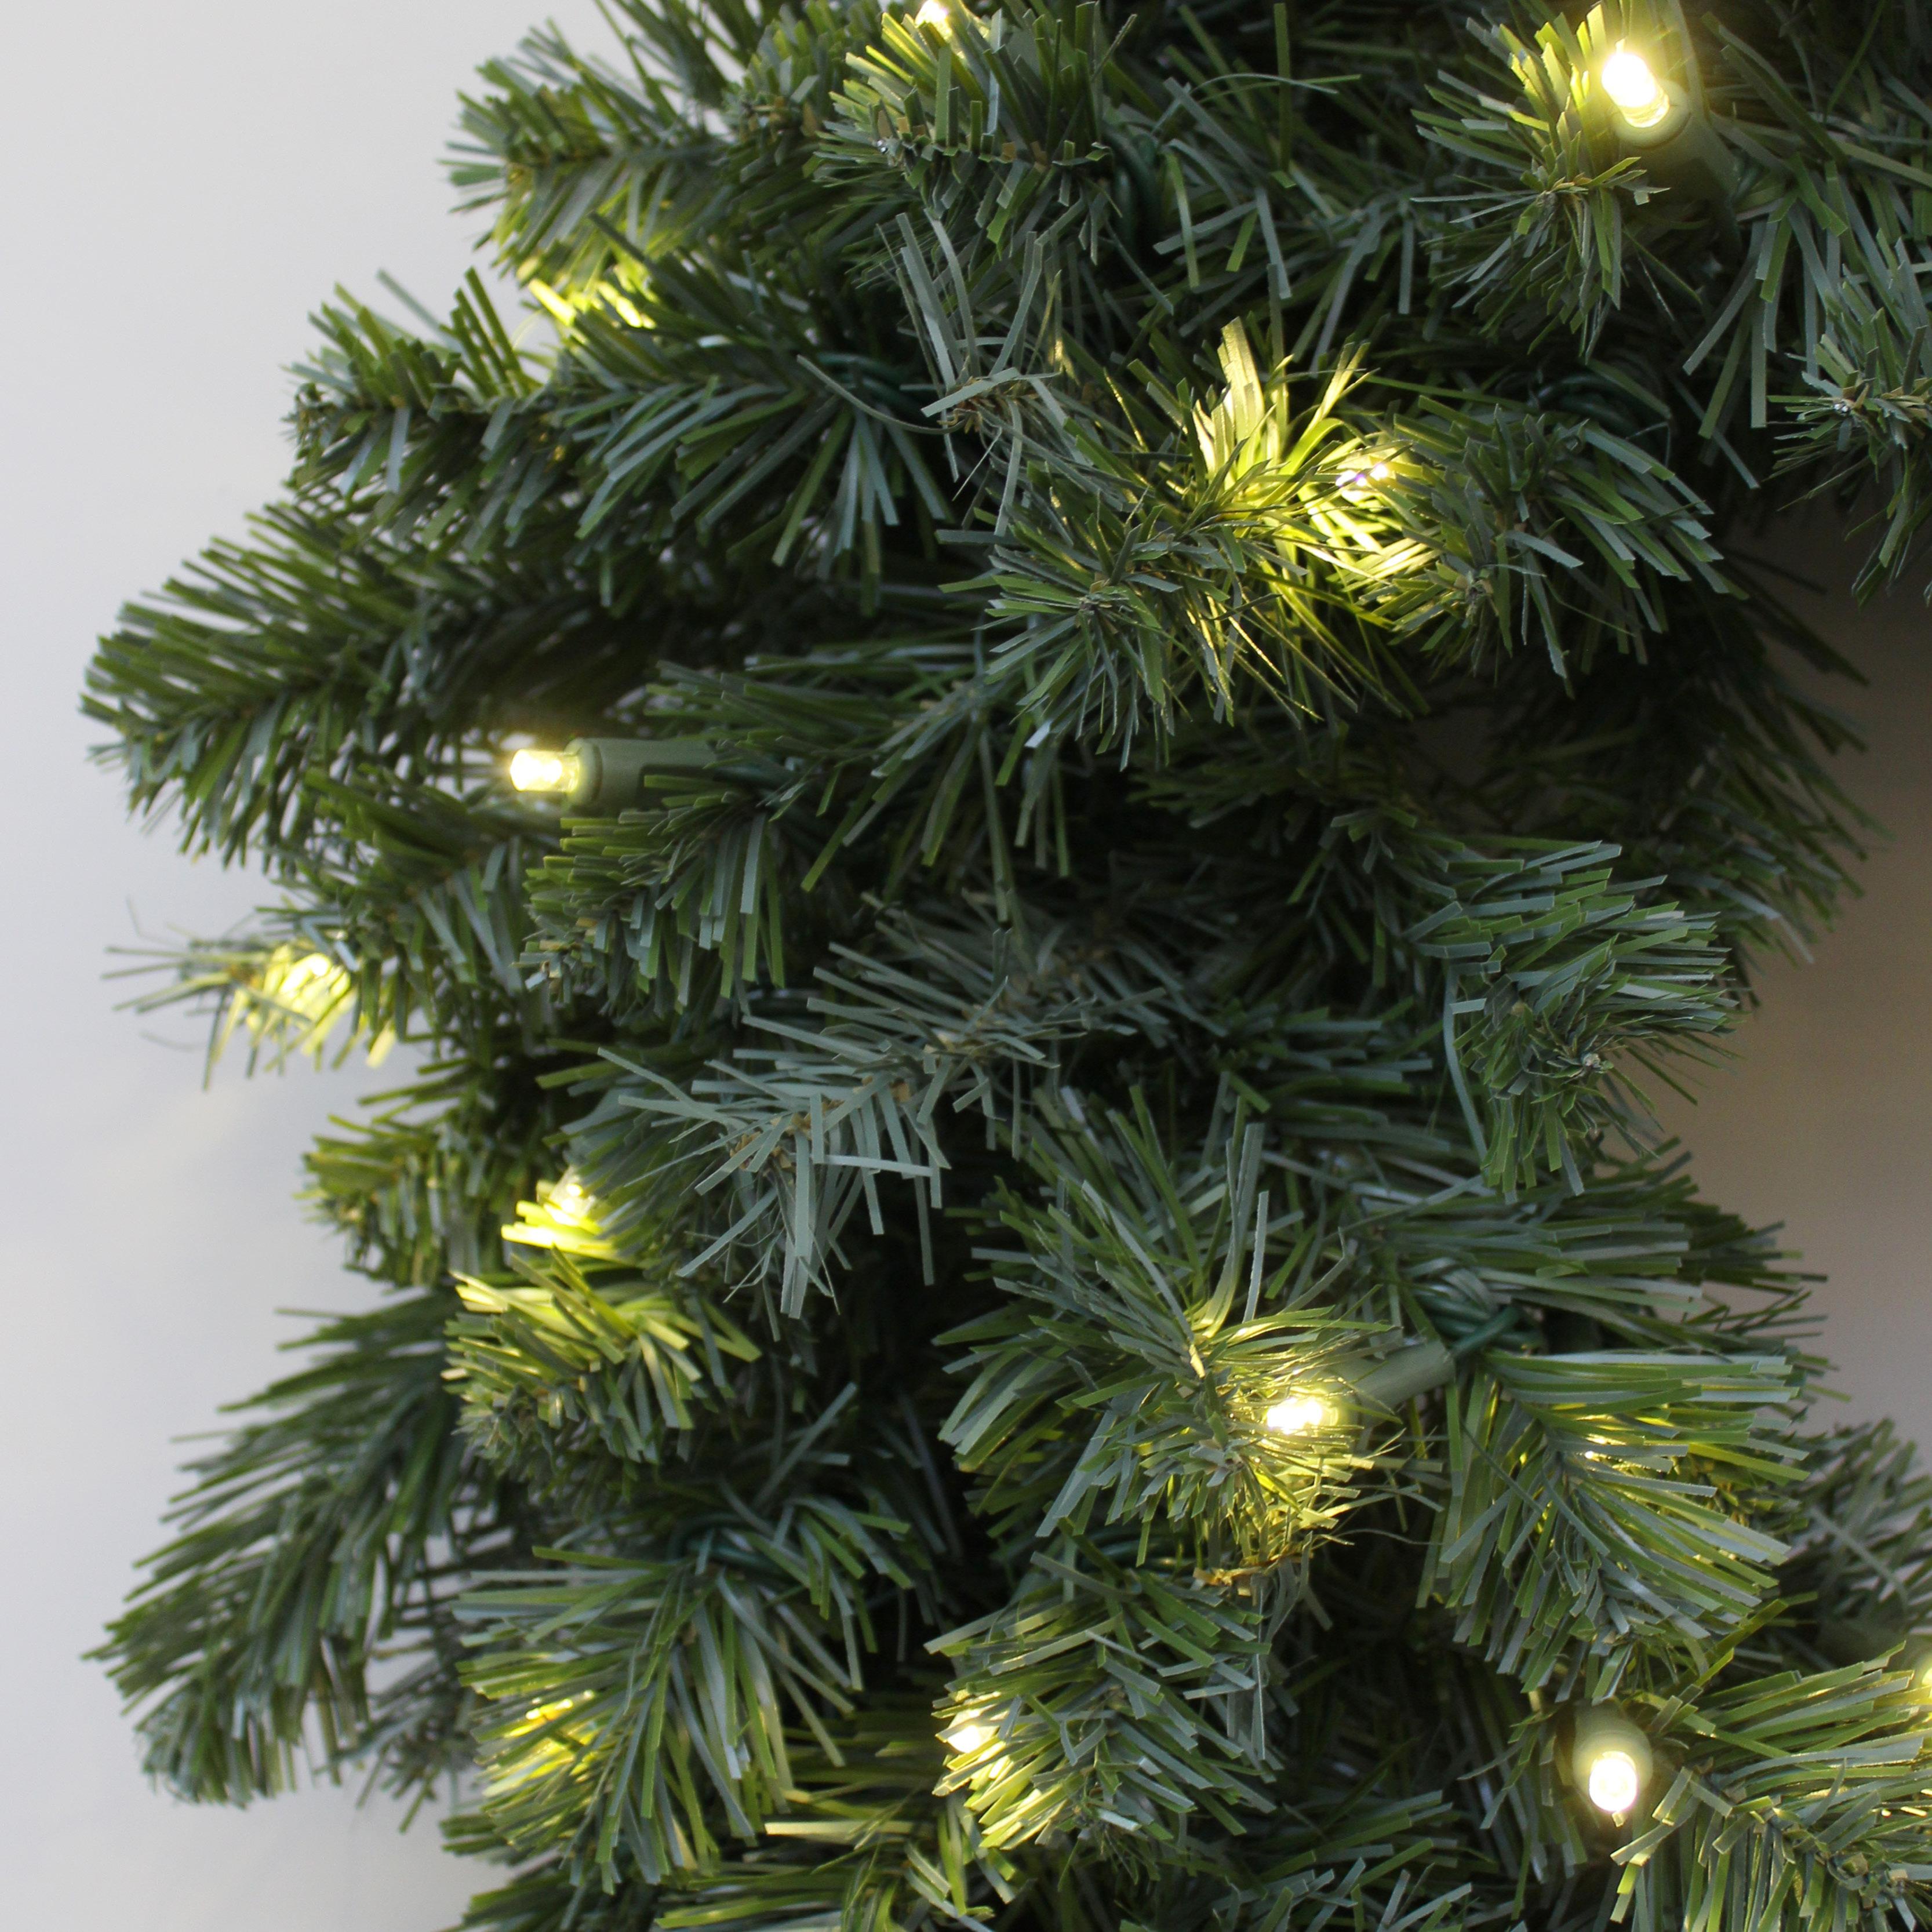 Northern Douglas Fir Christmas Artificial Christmas Wreath Pre-lit with LED Lights